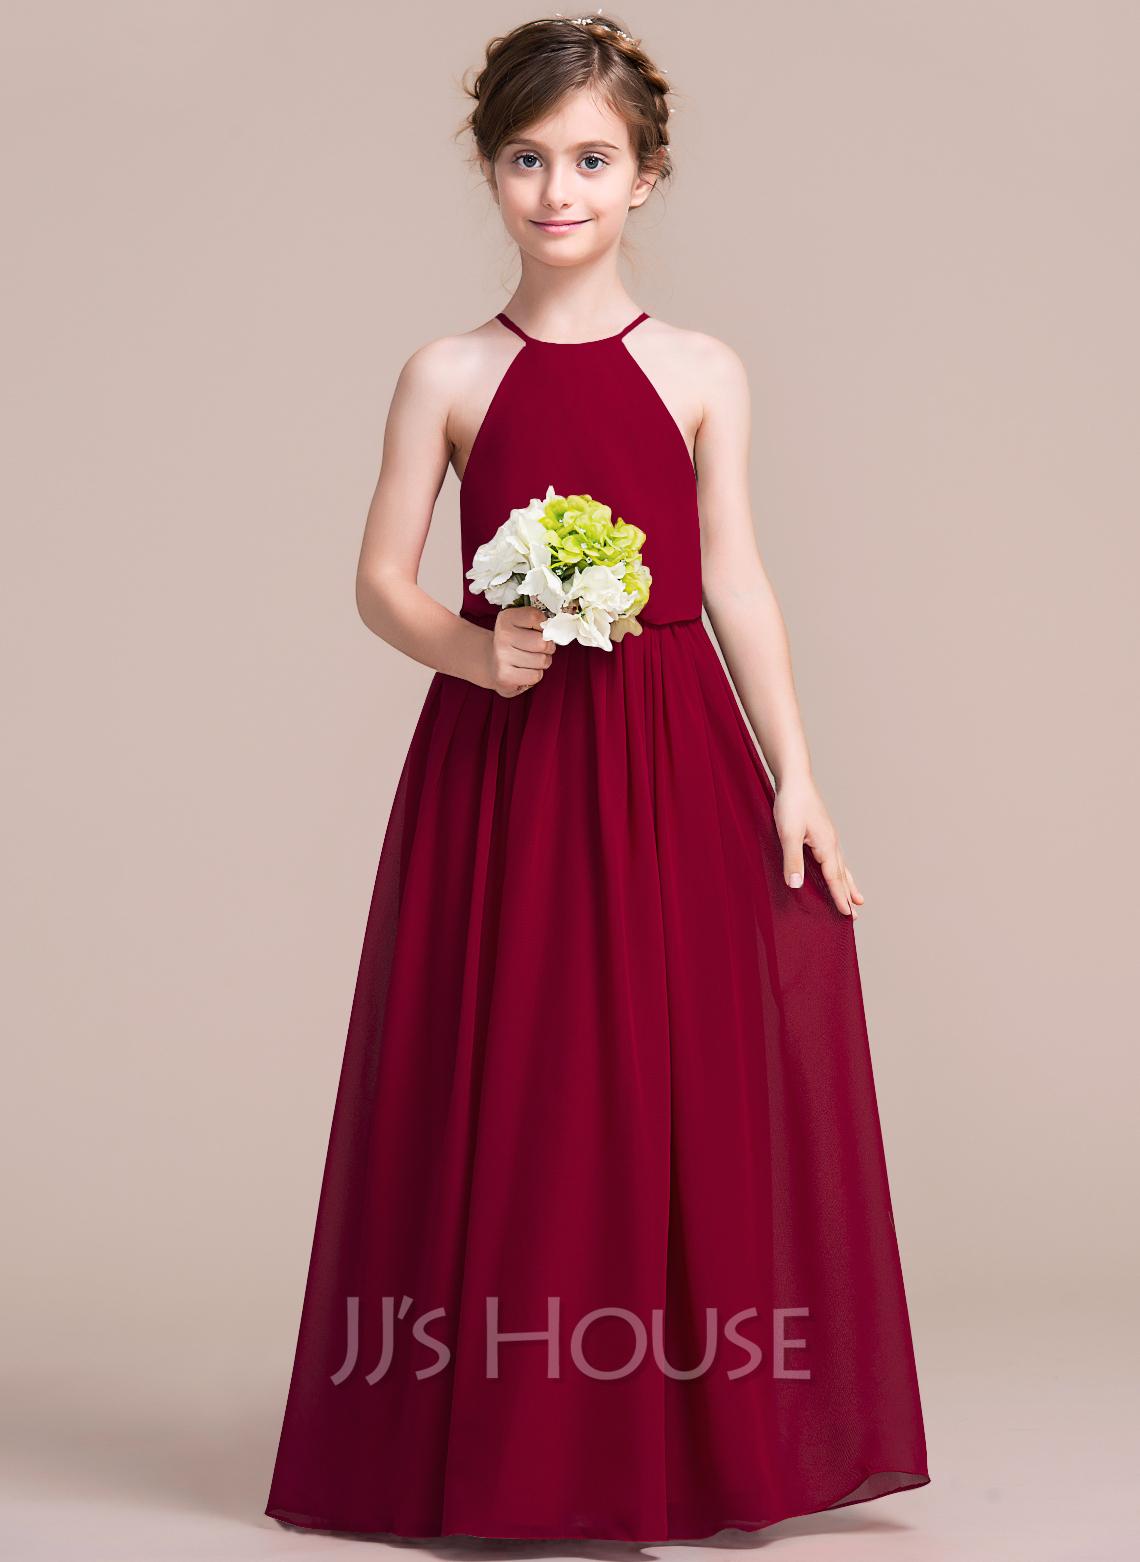 A-Line Scoop Neck Floor-Length Chiffon Junior Bridesmaid Dress